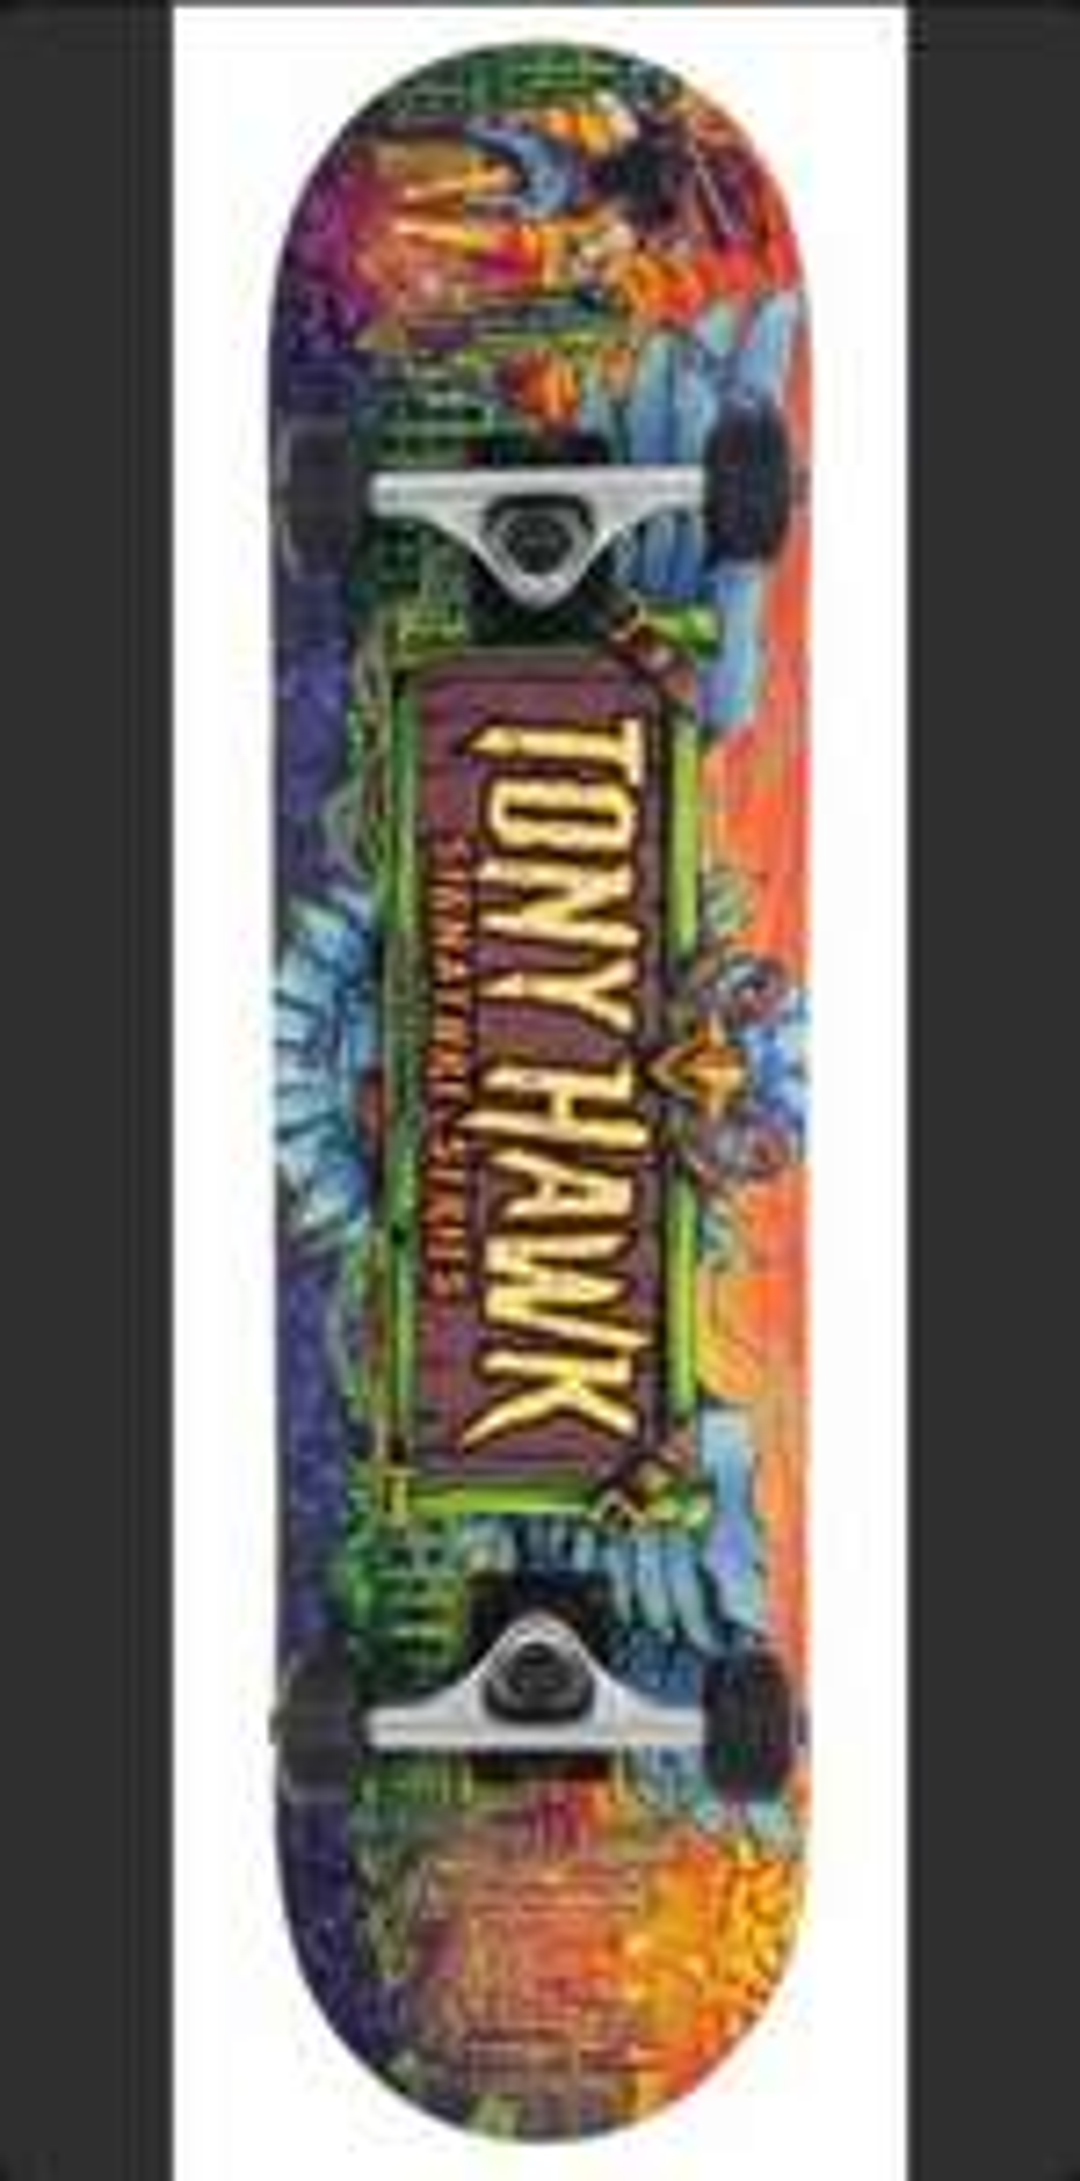 "Tony Hawk 360 Series Full Size Complete 7 Ply Maple Skateboard - Apocalypse 8"" £31.97 delivered at Ebay/skatesuk"